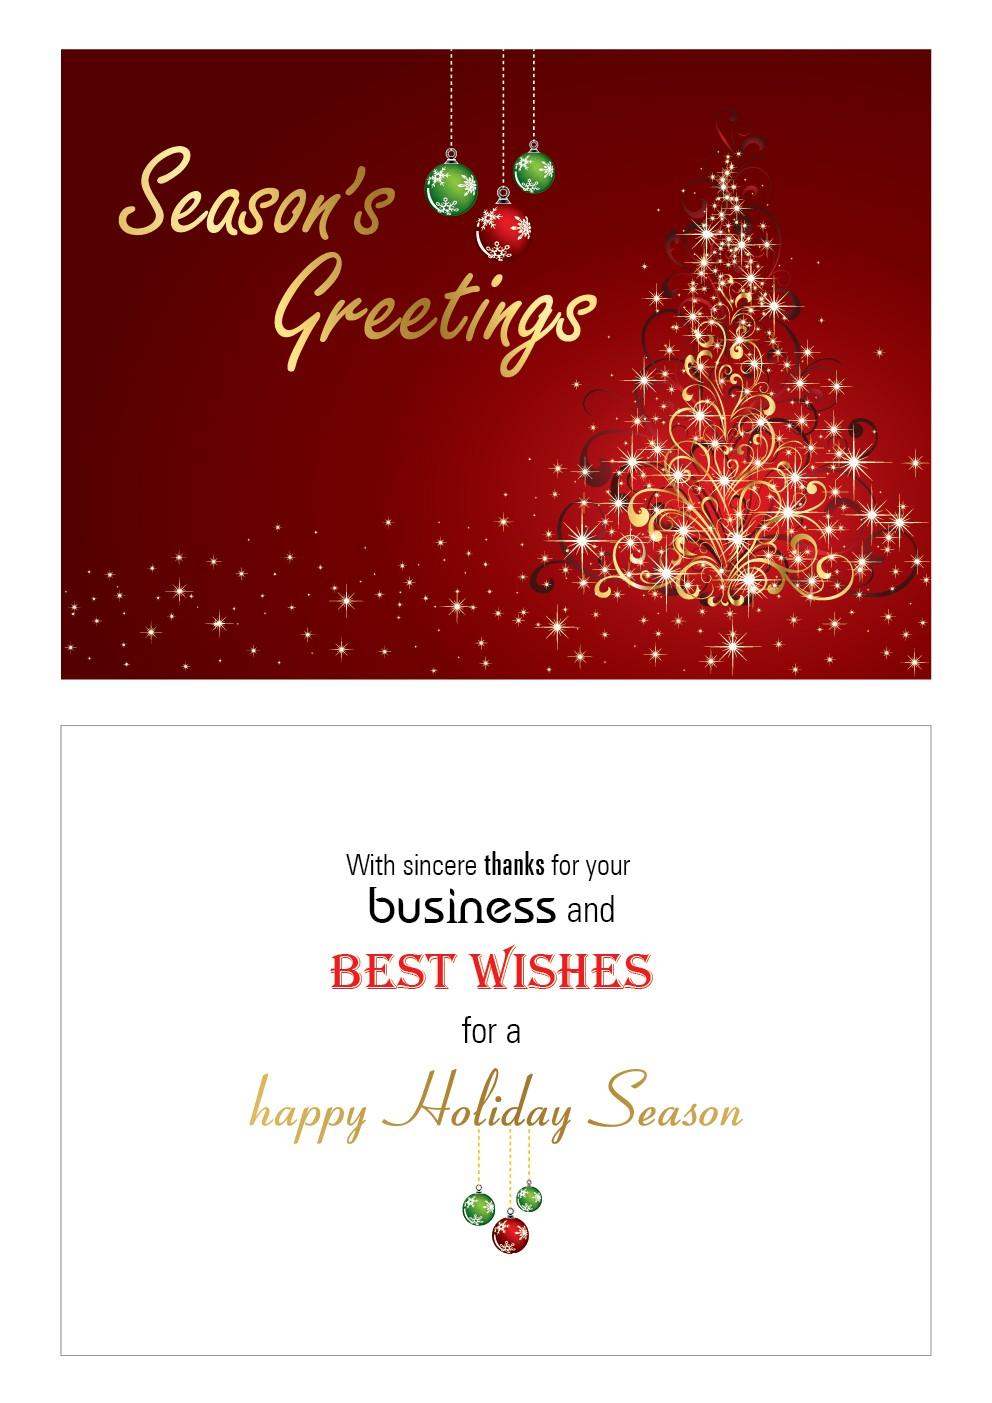 Holiday greeting cards -  Will award upto 15 winners!